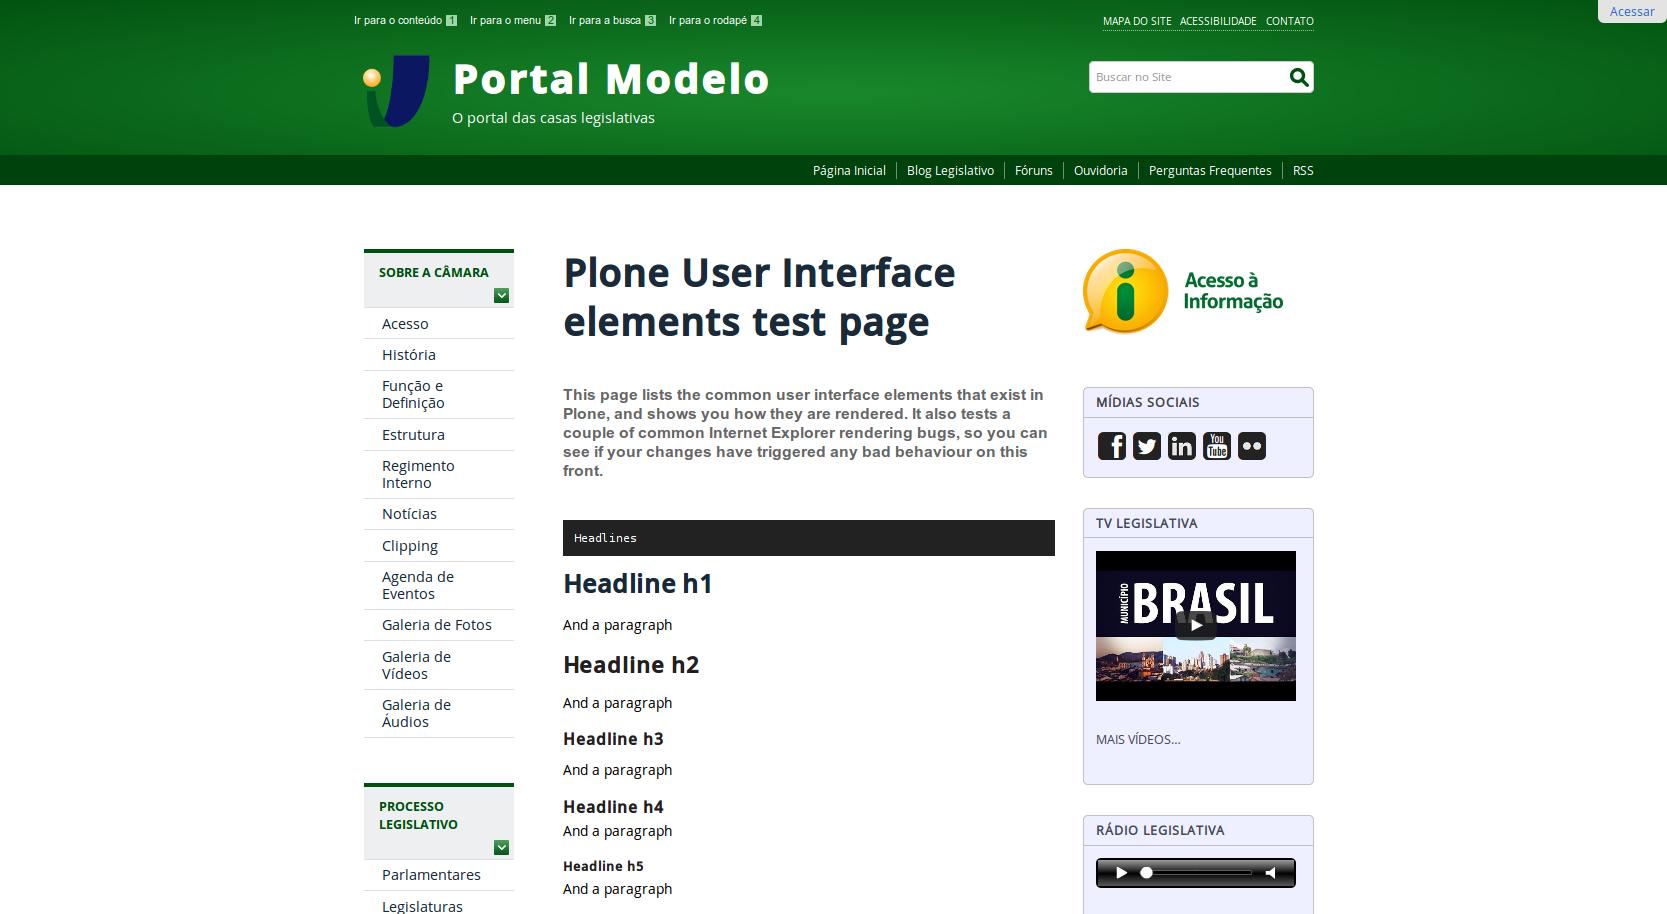 https://raw.githubusercontent.com/interlegis/interlegis.portalmodelo.theme/master/src/interlegis/portalmodelo/theme/themes/IDG-verde/preview.png